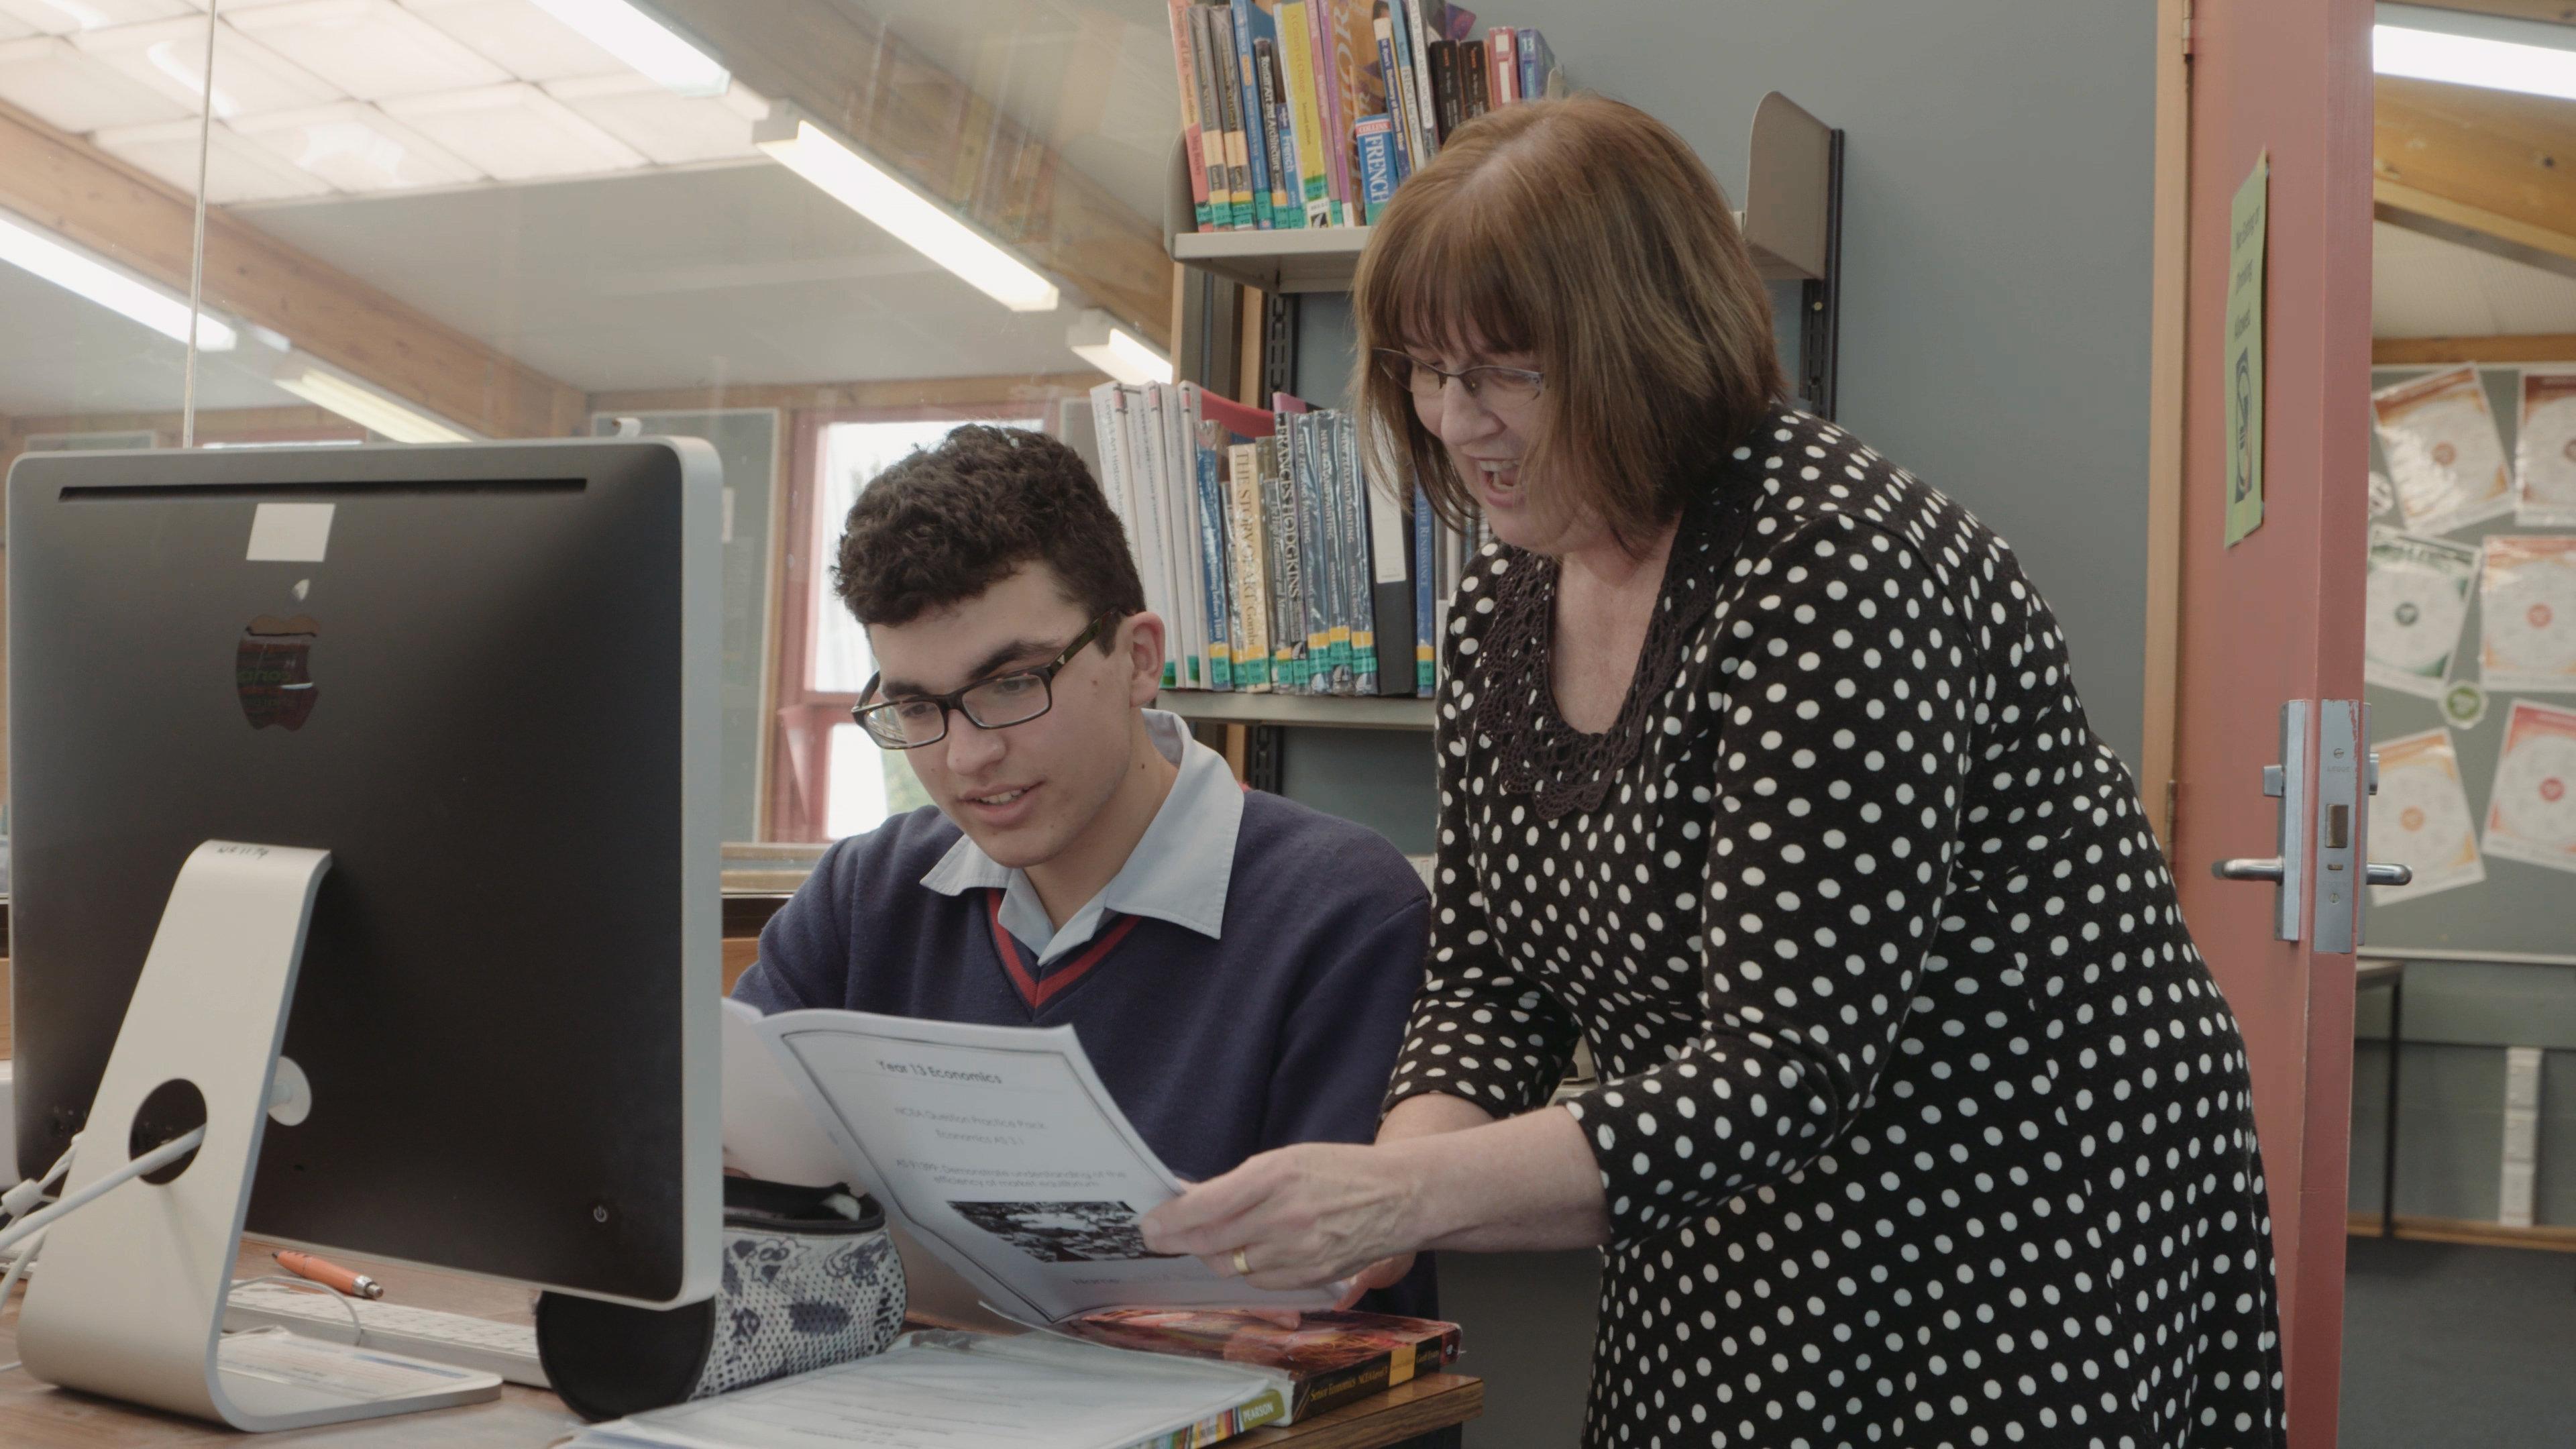 Ashburton College student and e-teacher